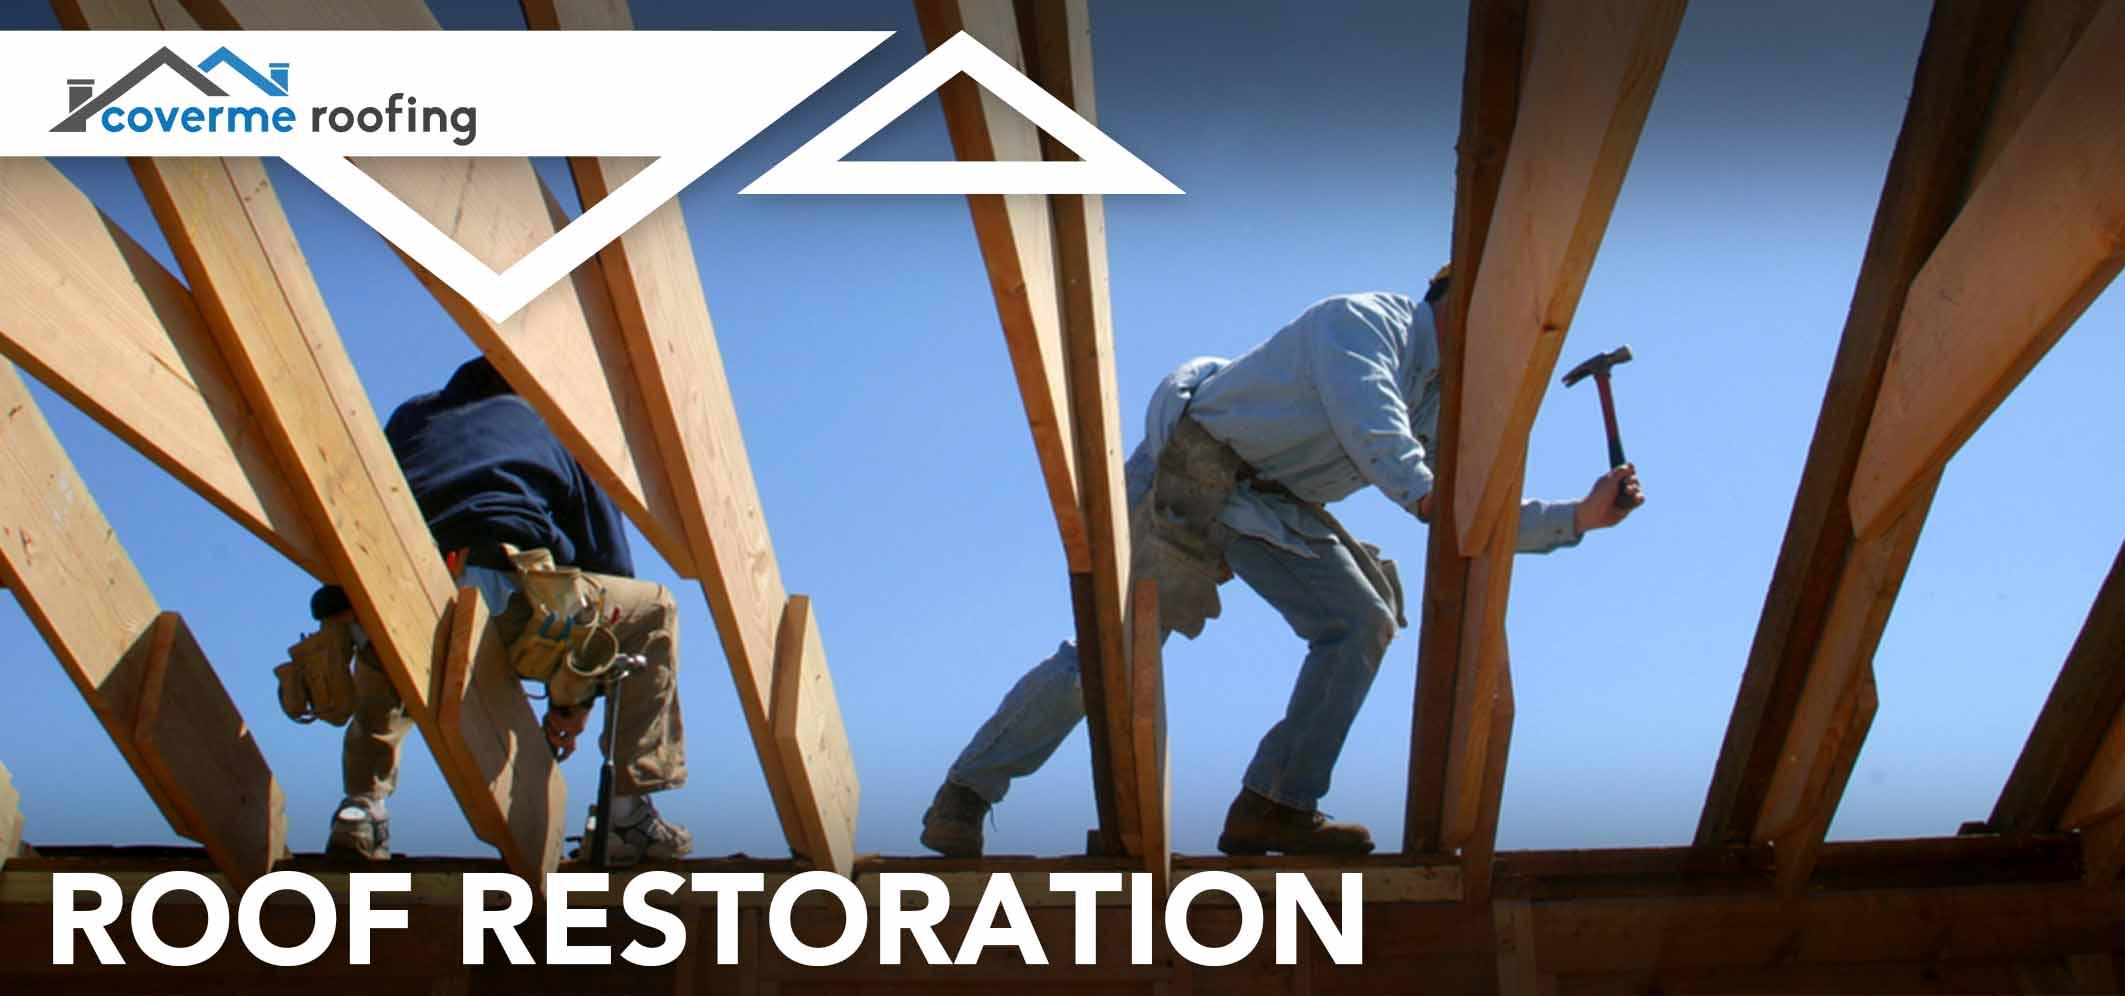 two workers repairing roof